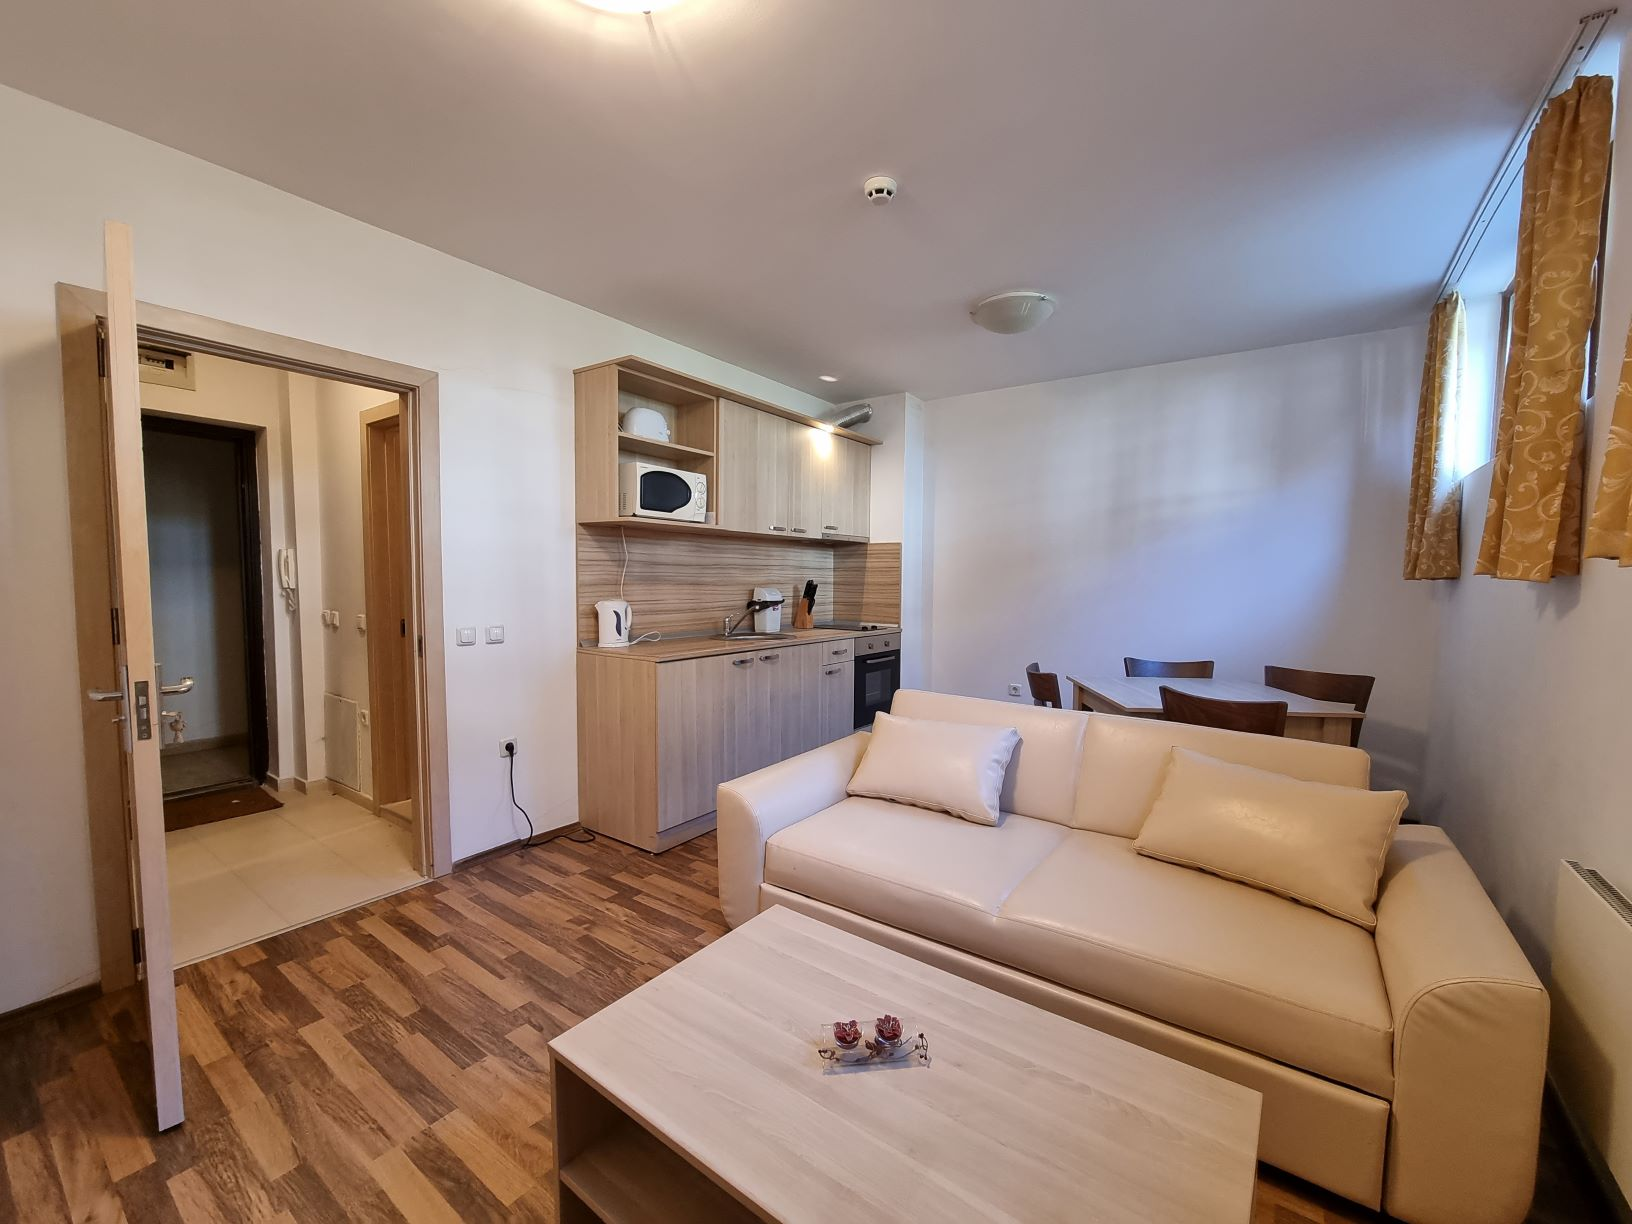 Budget studio for sale in Pirin Heights Bansko